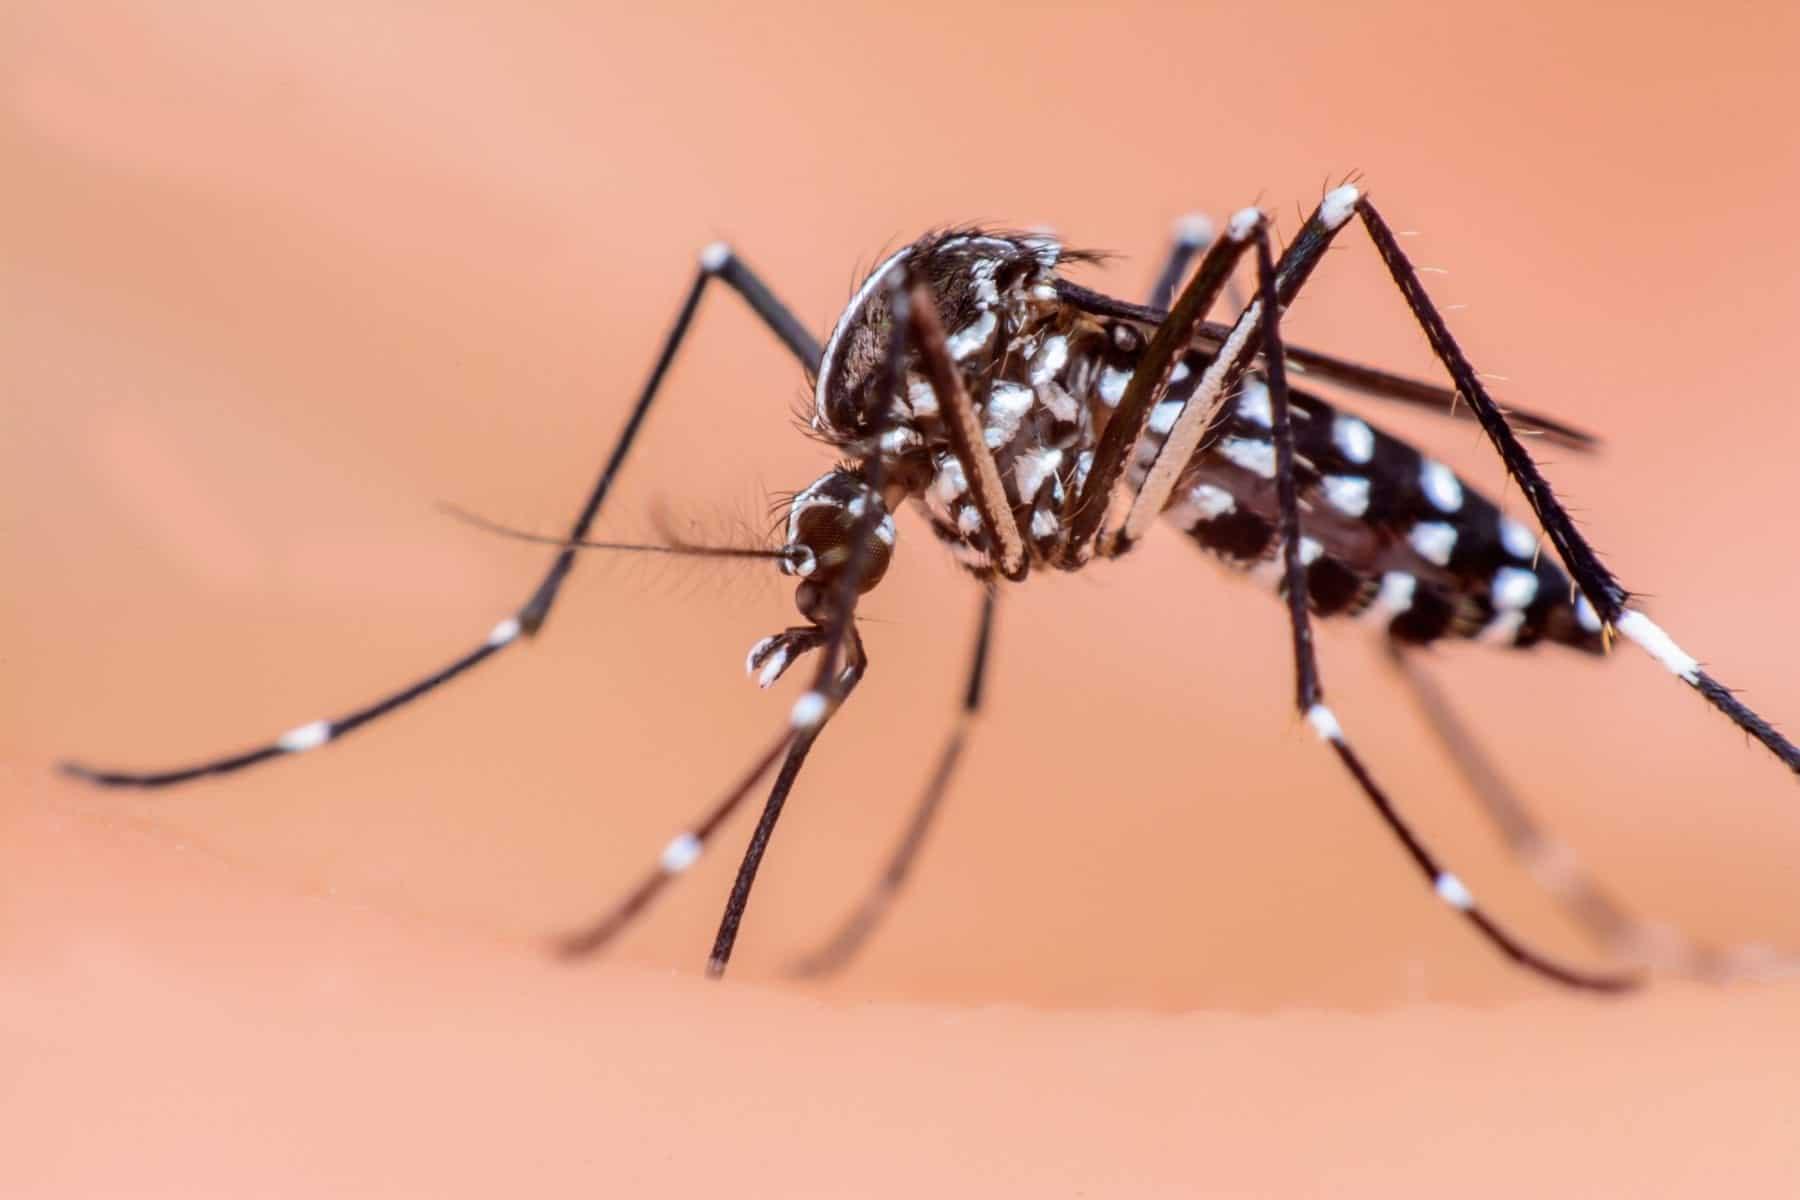 Mosquito-Control-Jackson-Madison-Mosquito